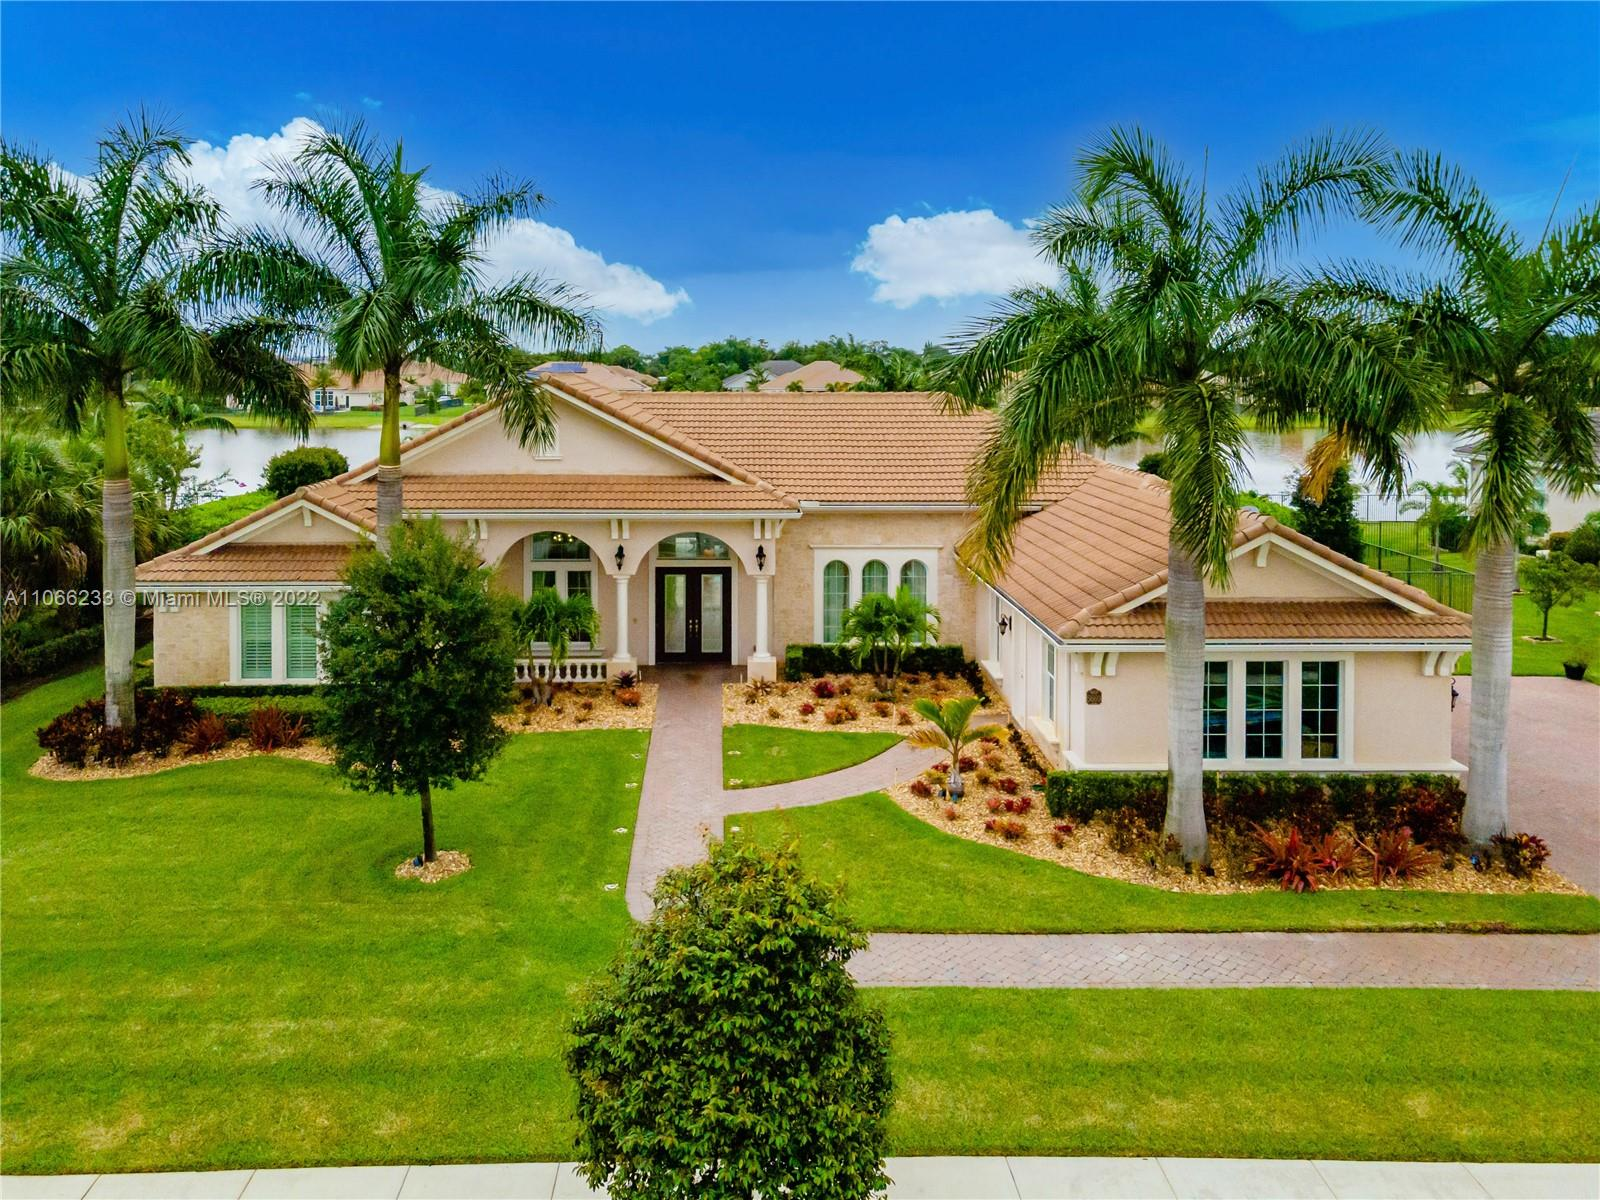 5669 Sterling Ranch Dr, Davie, Florida 33314